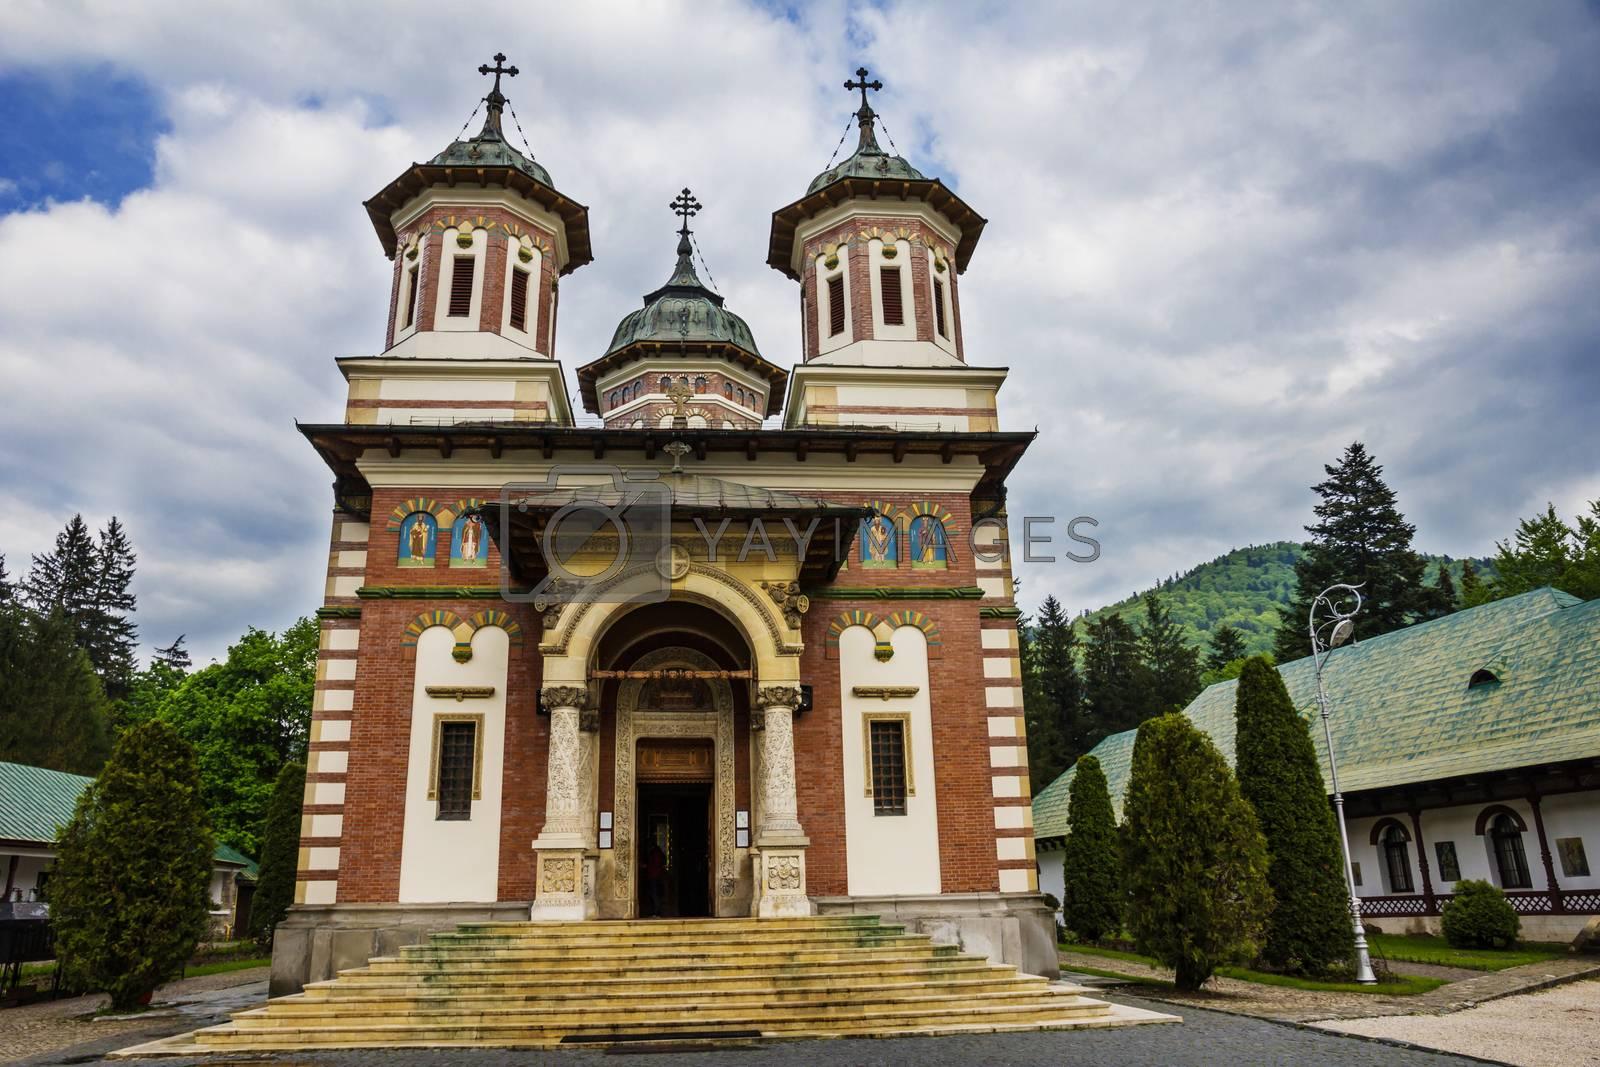 Romanian Sinaia monastery, Sinaia - Romania by maggee